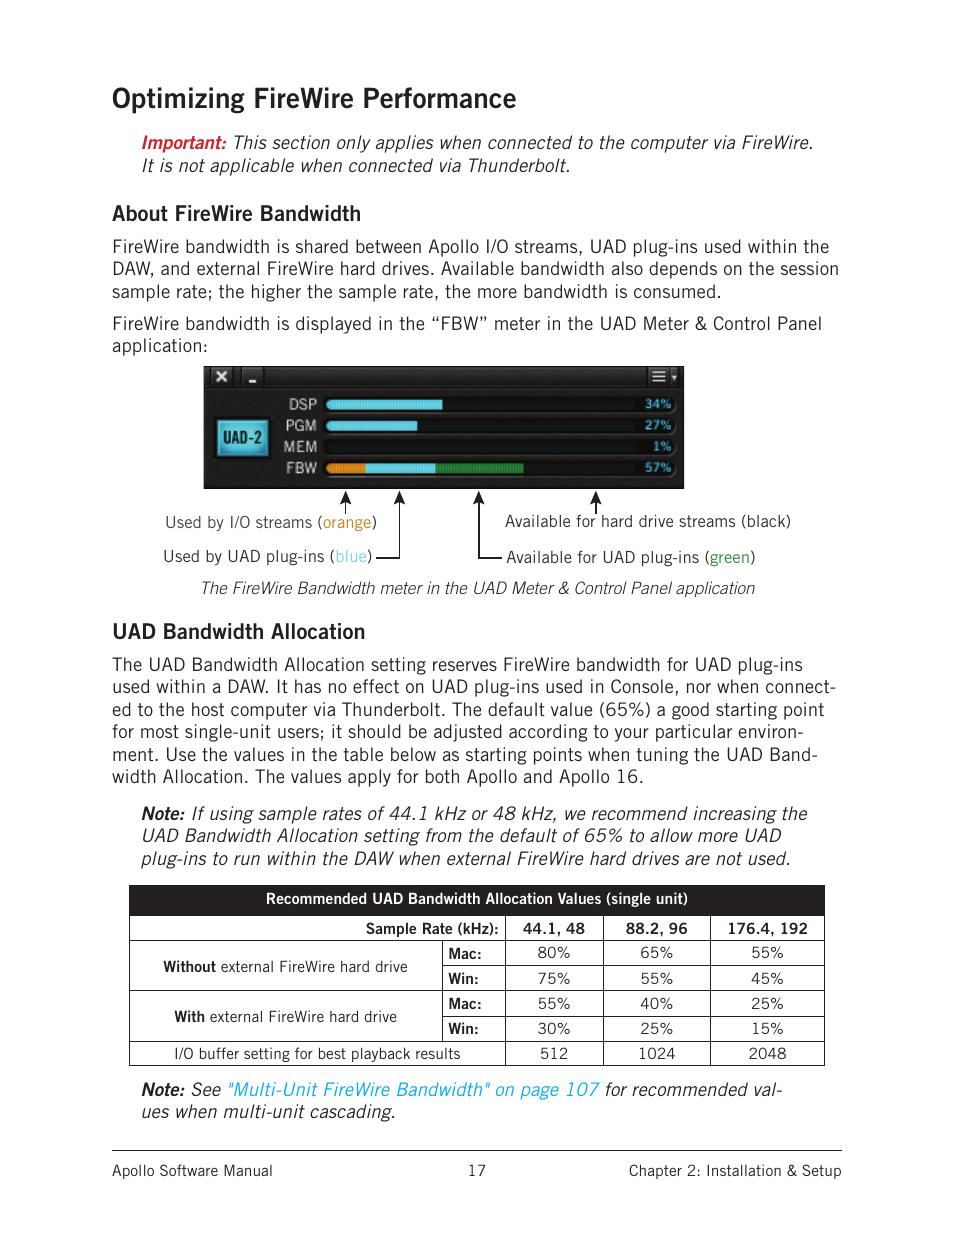 Optimizing firewire performance, About firewire bandwidth, Uad